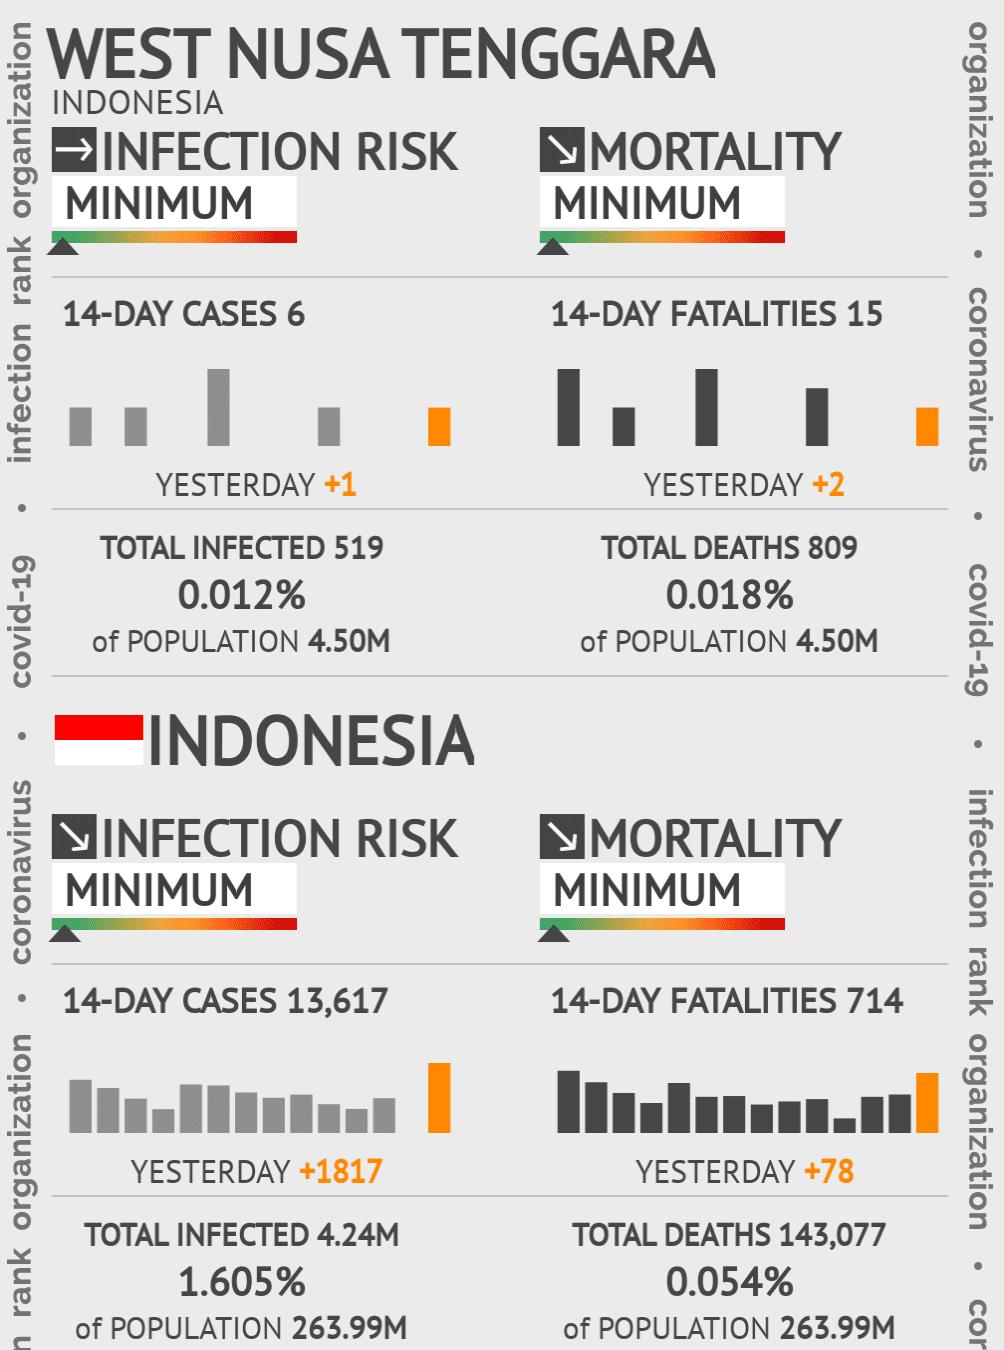 West Nusa Tenggara Coronavirus Covid-19 Risk of Infection on February 28, 2021